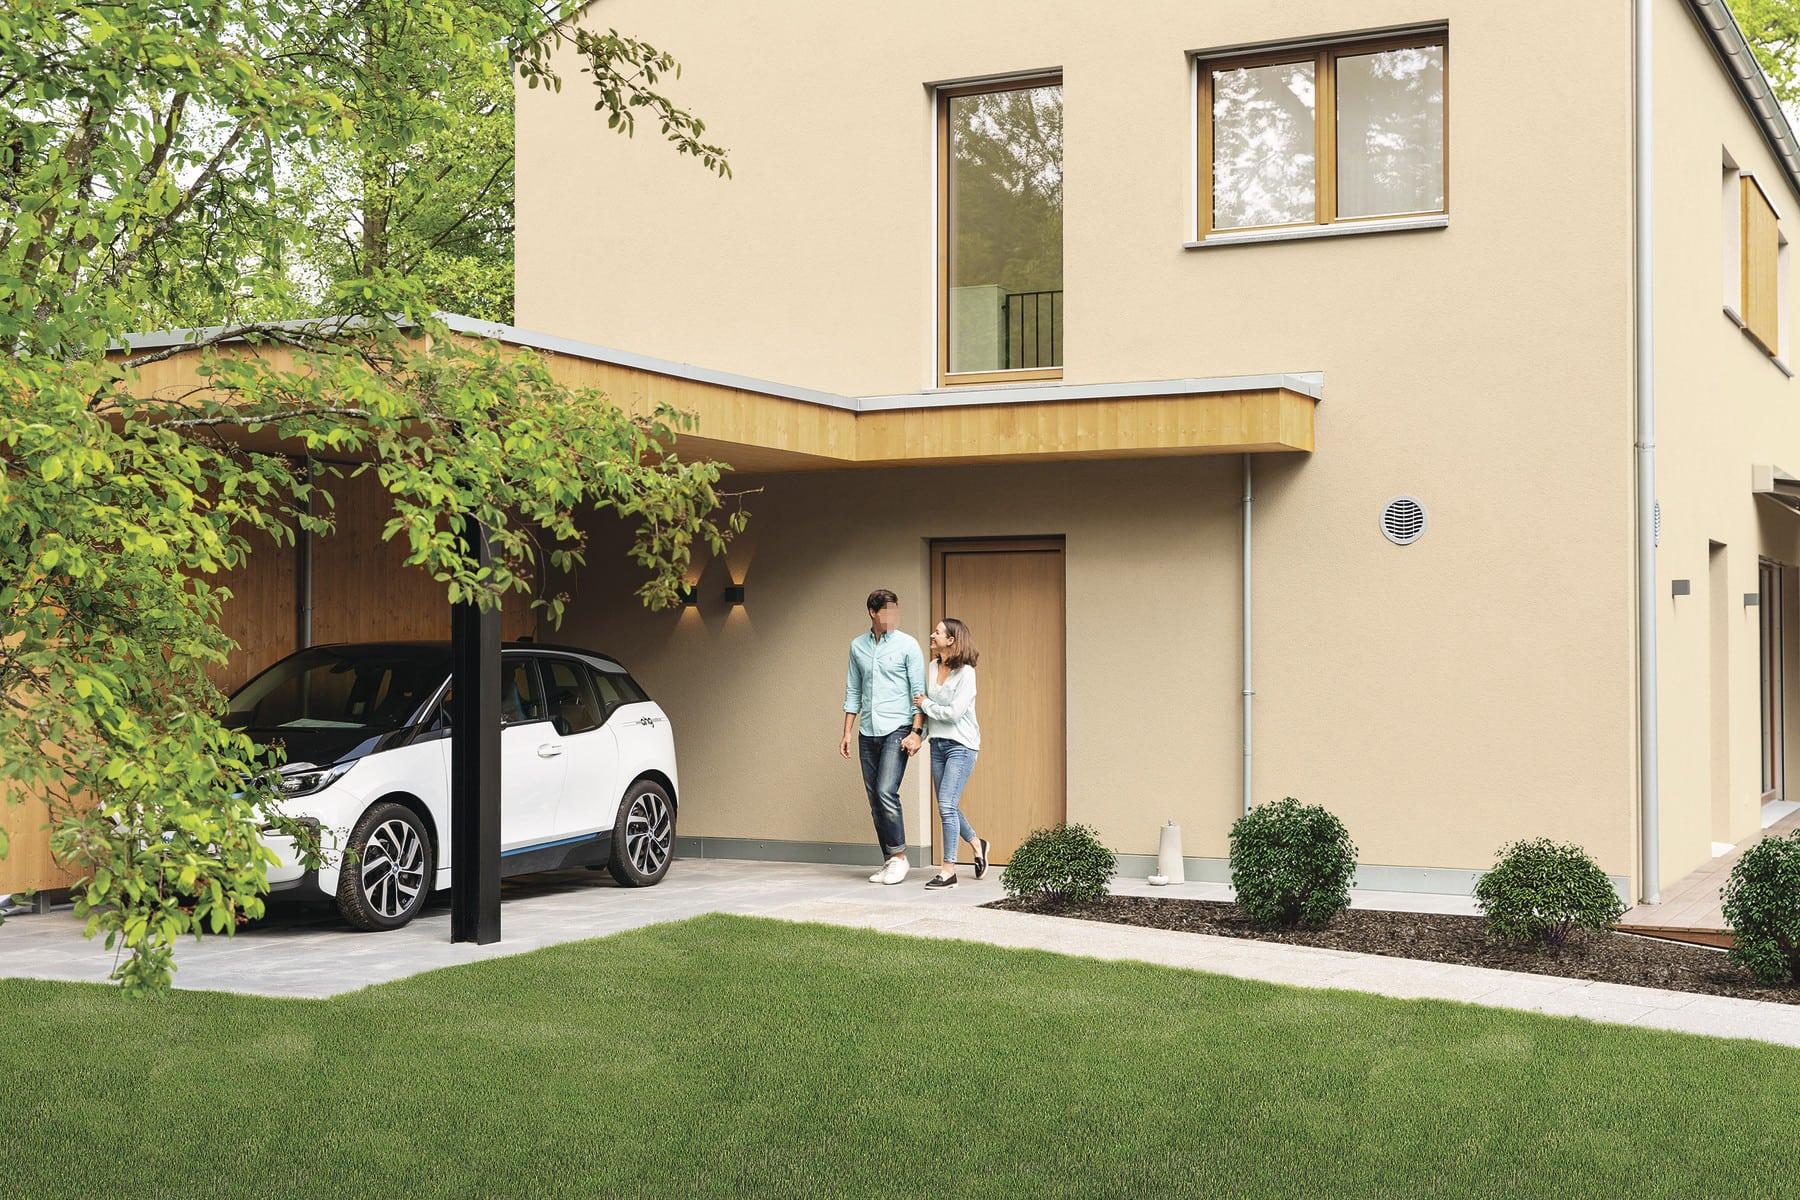 Einfamilienhaus modern mit integriertem Carport & Vordach - Haus Design Ideen Fertighaus Sunshine 220 WeberHaus - HausbauDirekt.de